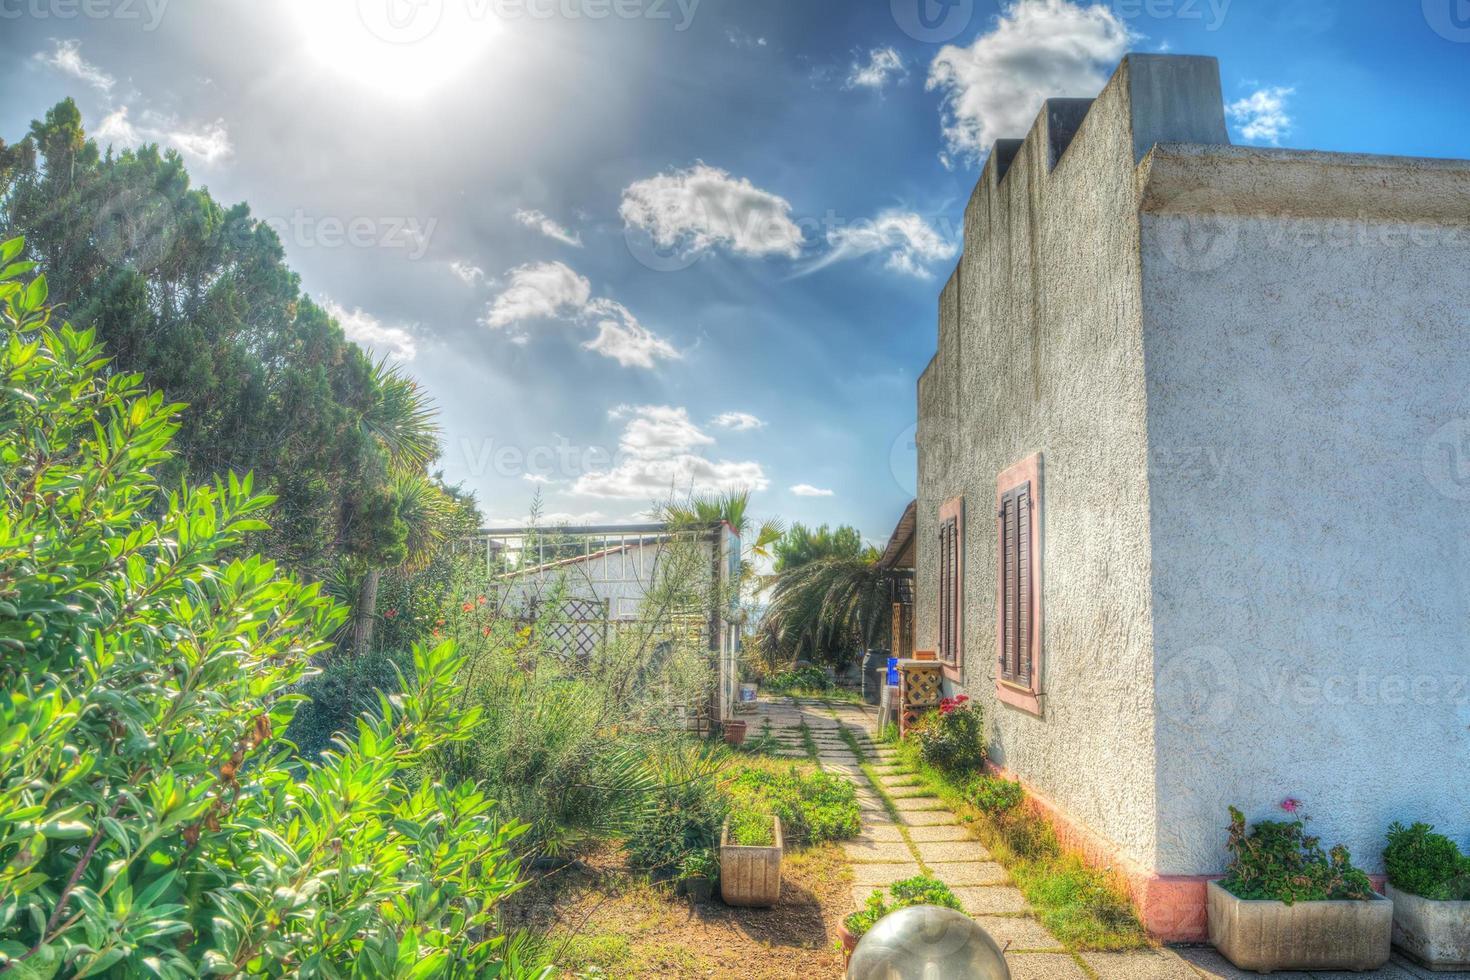 maison pittoresque en Sardaigne photo